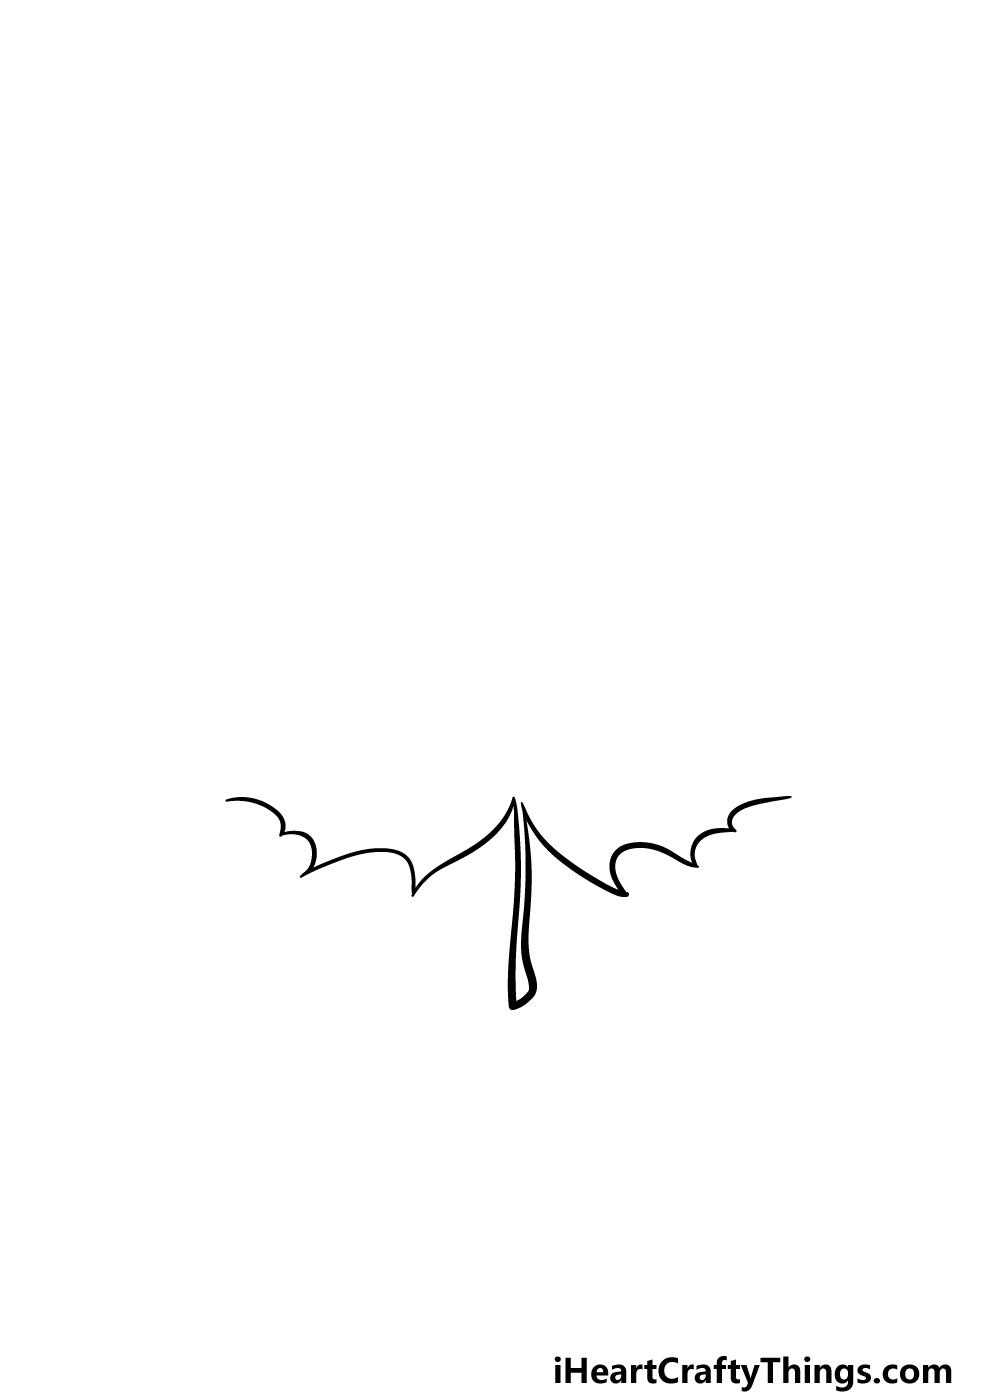 drawing a maple leaf step 1